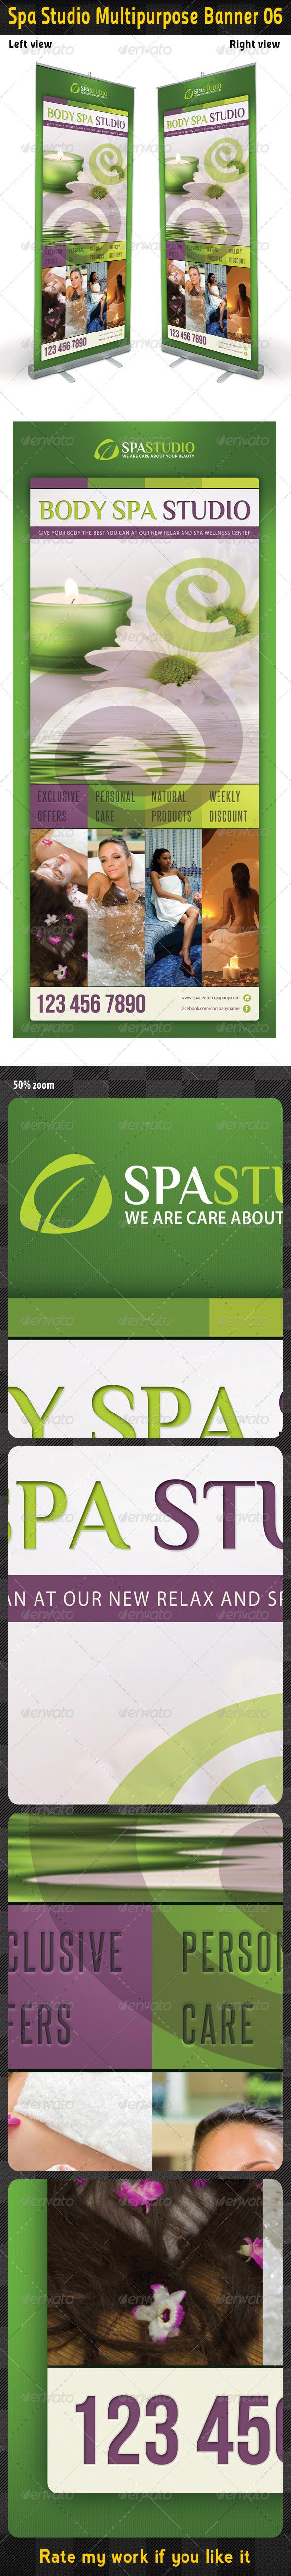 Spa Studio Multipurpose Banner 06 - Signage Print Templates